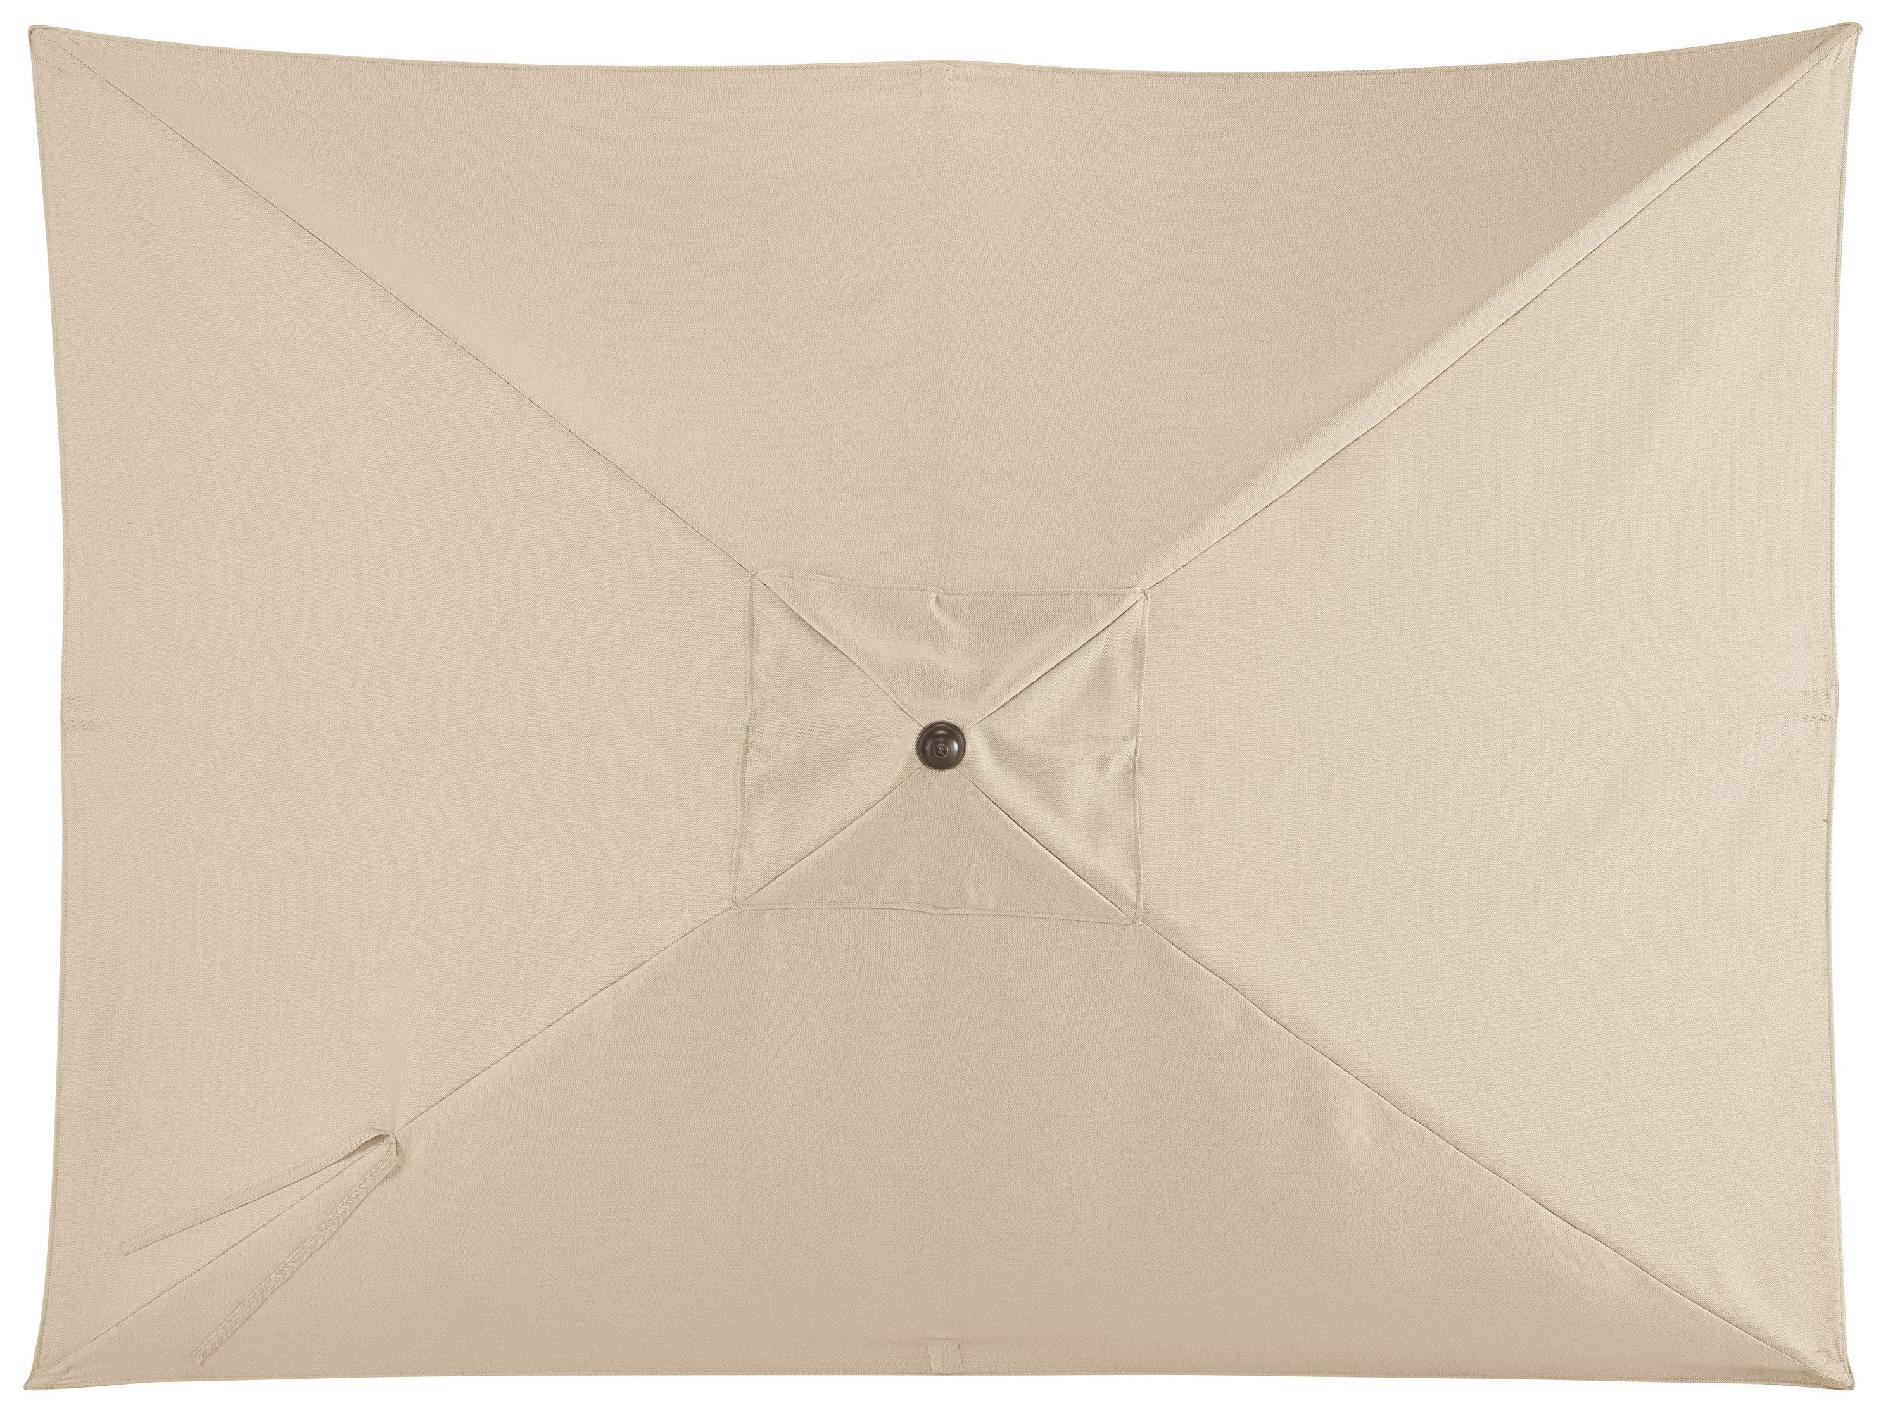 Grand Resort River Oak 9 Feet Rectangular Umbrella